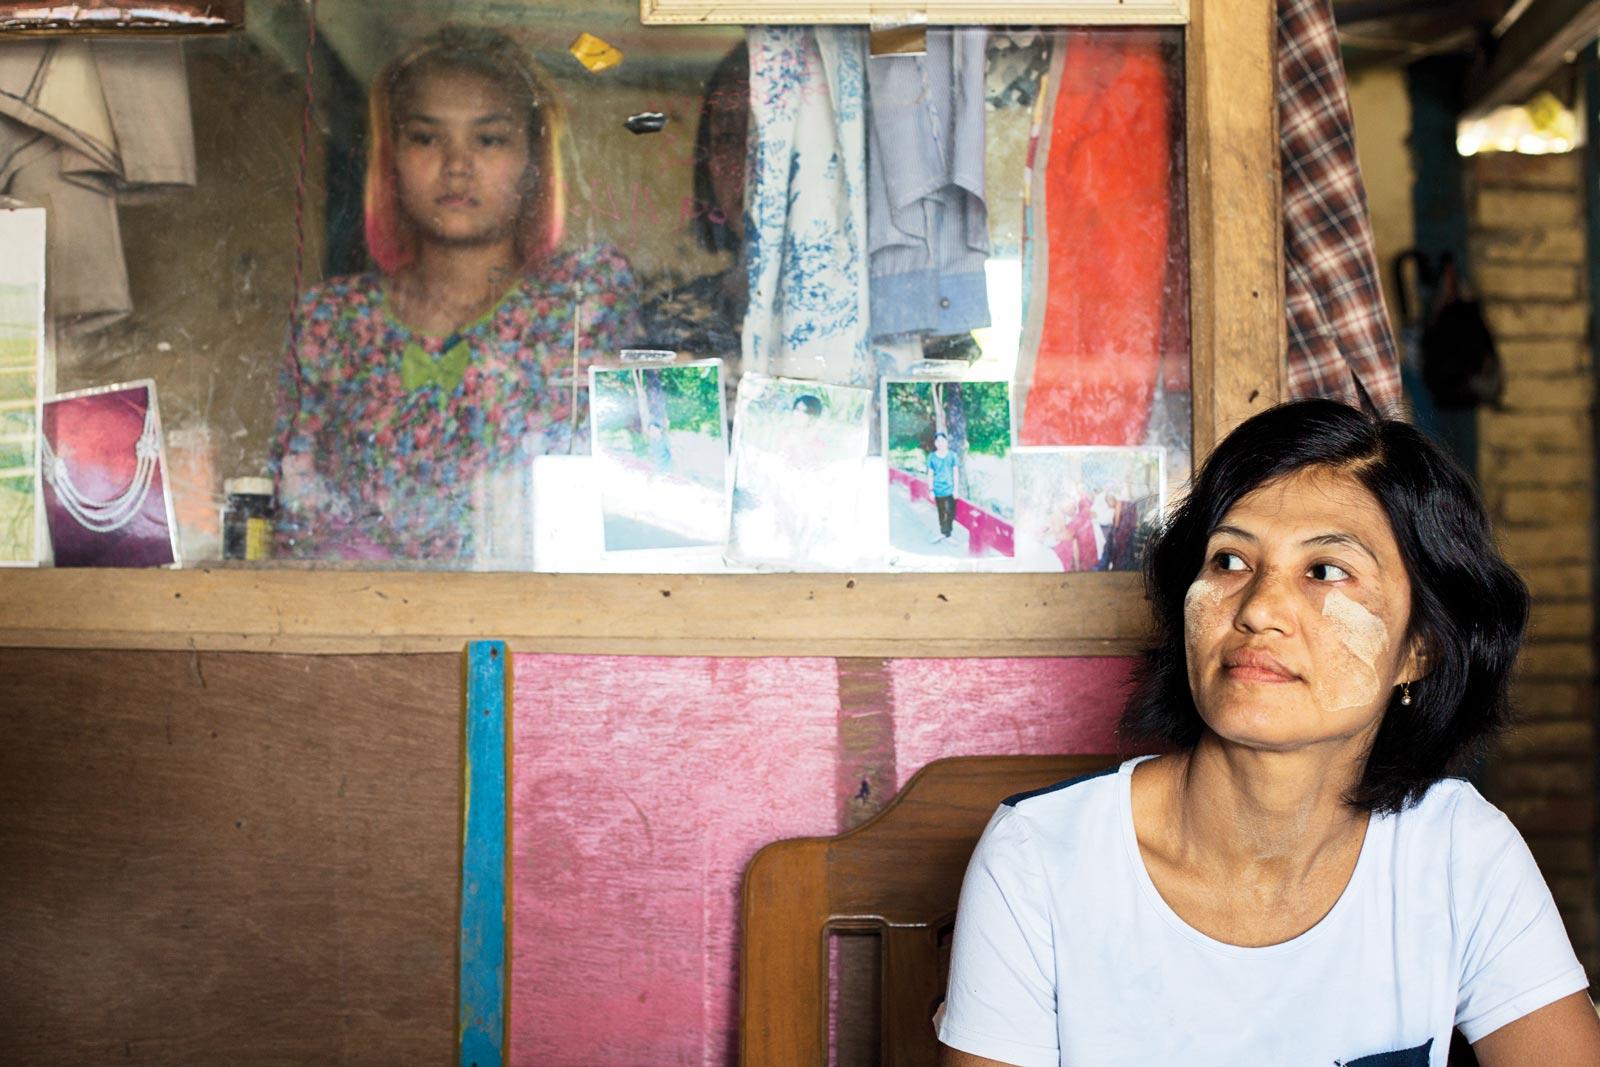 Khin Thein, chair of the local chapter of the Rakhine Women's Network, in her jewellery shop. Photo: Antolín Avezuela Aristu